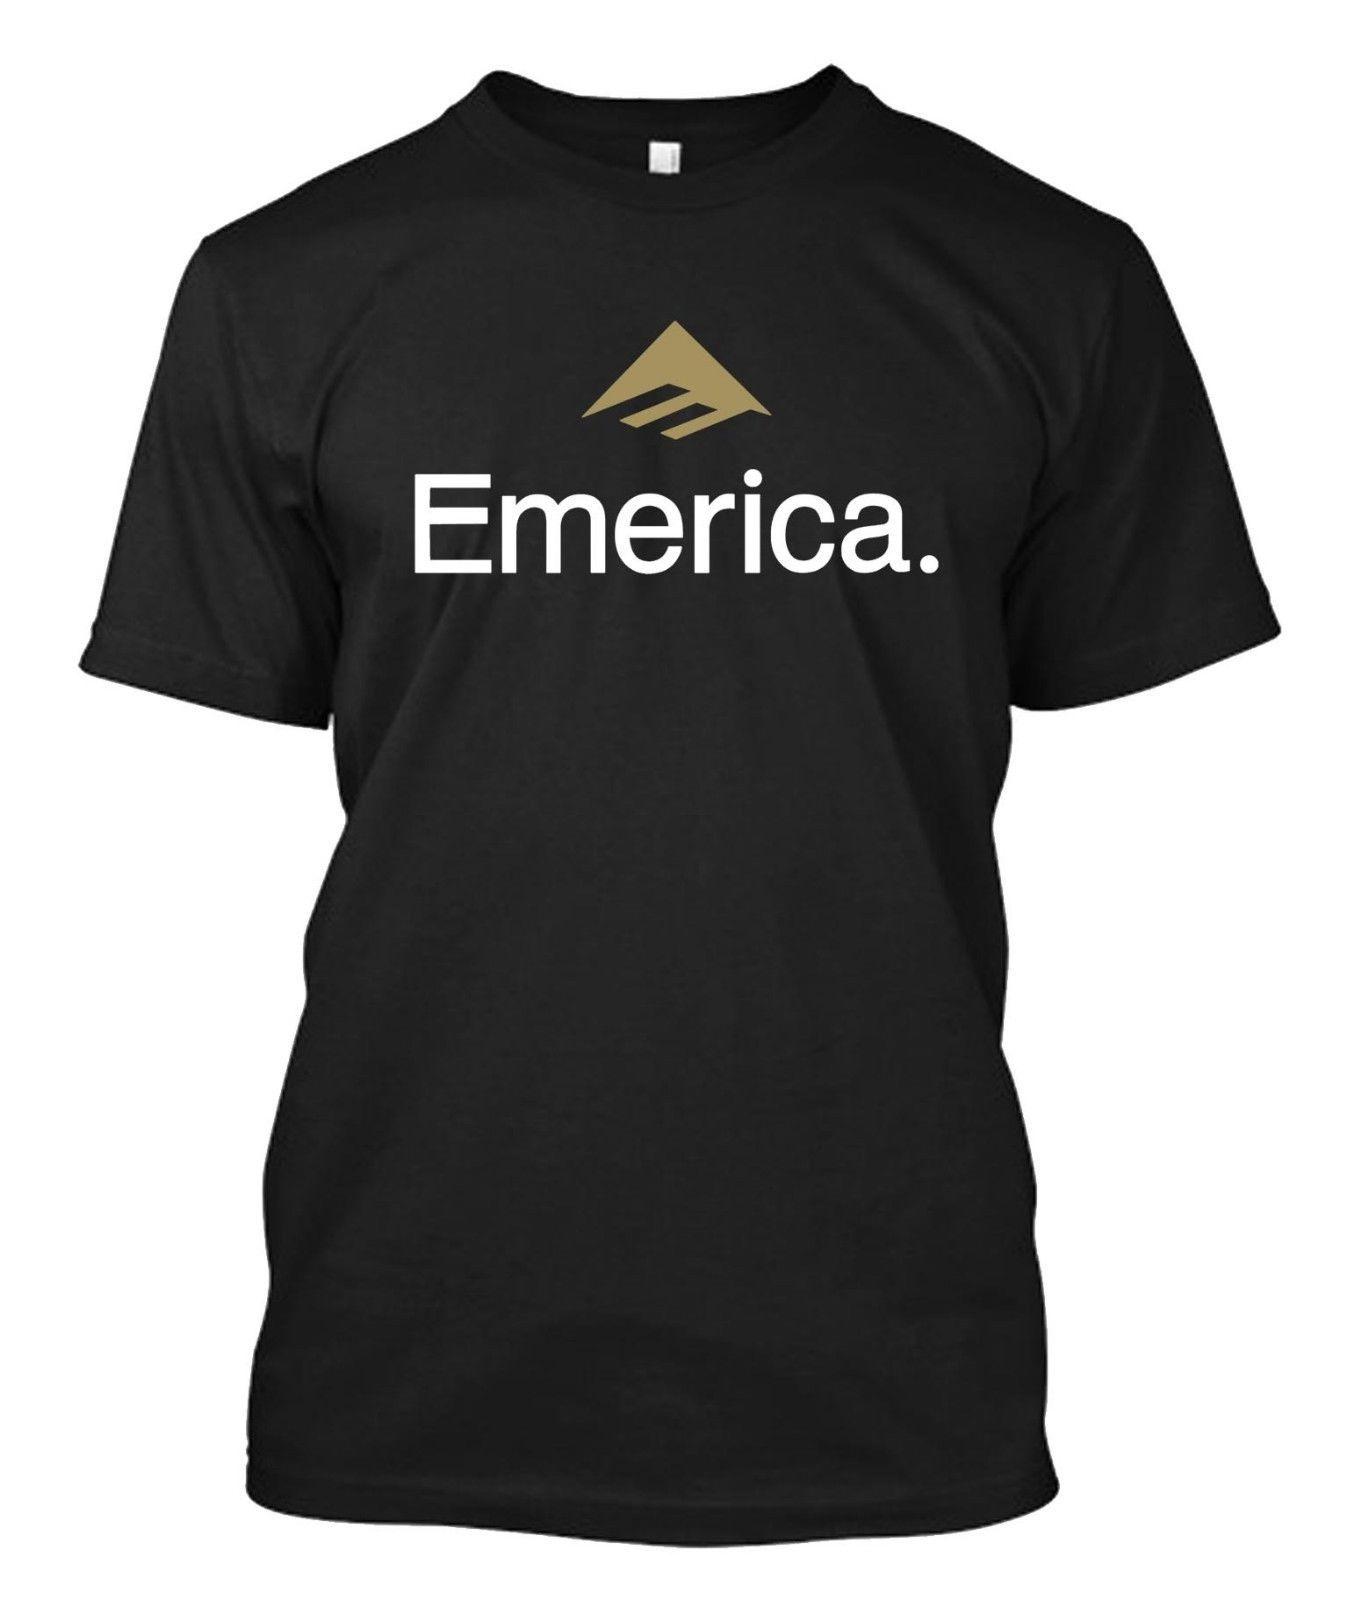 ce1c030a0b33bd Emerica - Skateboard Logo - Custom Men's Black T-Shirt Online with ...